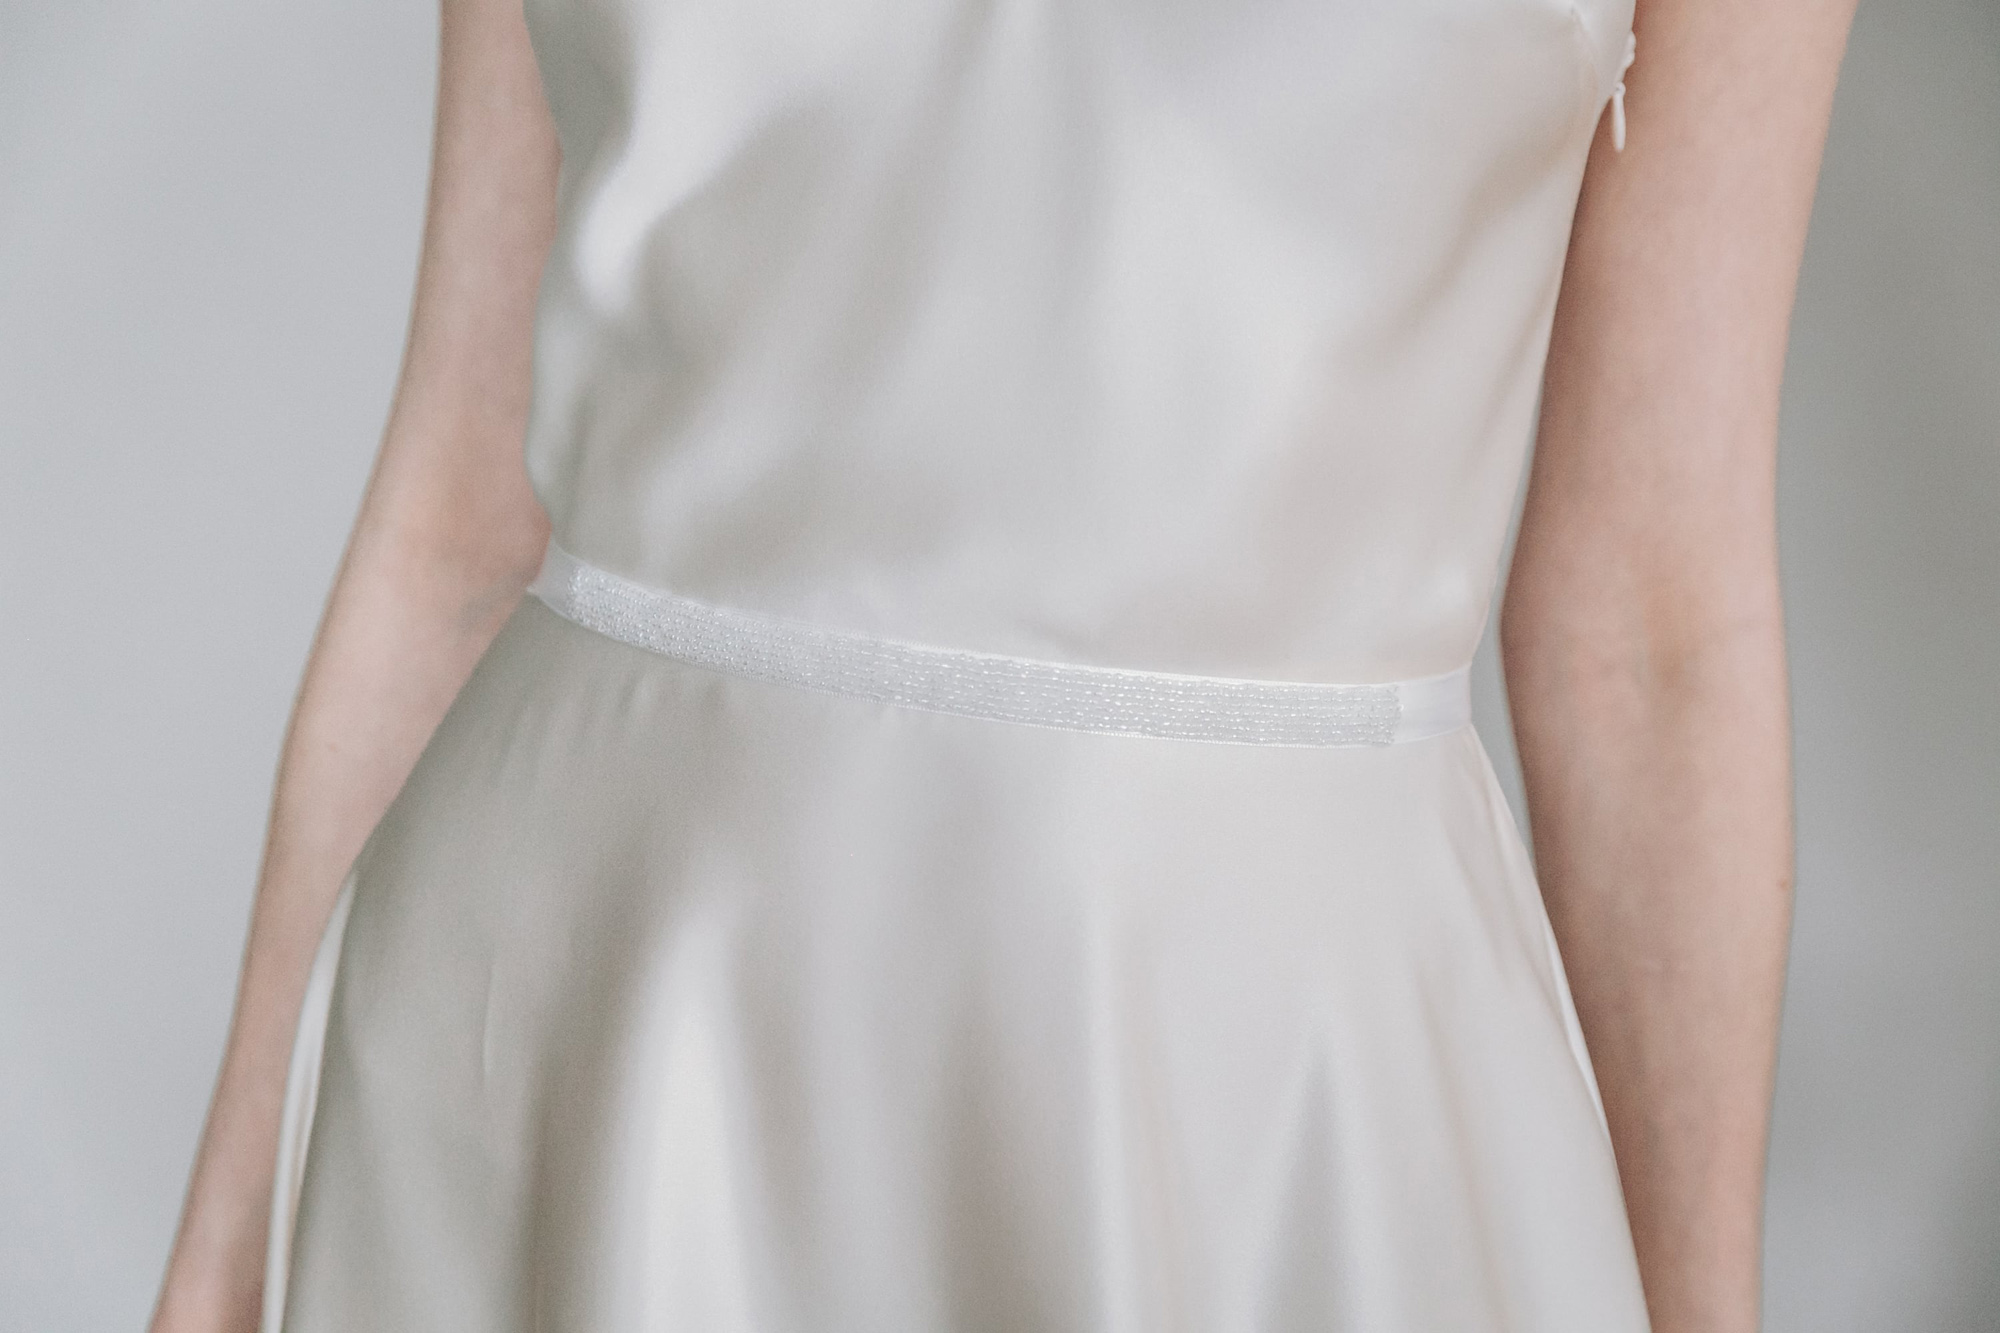 Kate-Beaumont-Sheffield-Iridescent-Beaded-Belt-Wedding-Sash-1.jpg